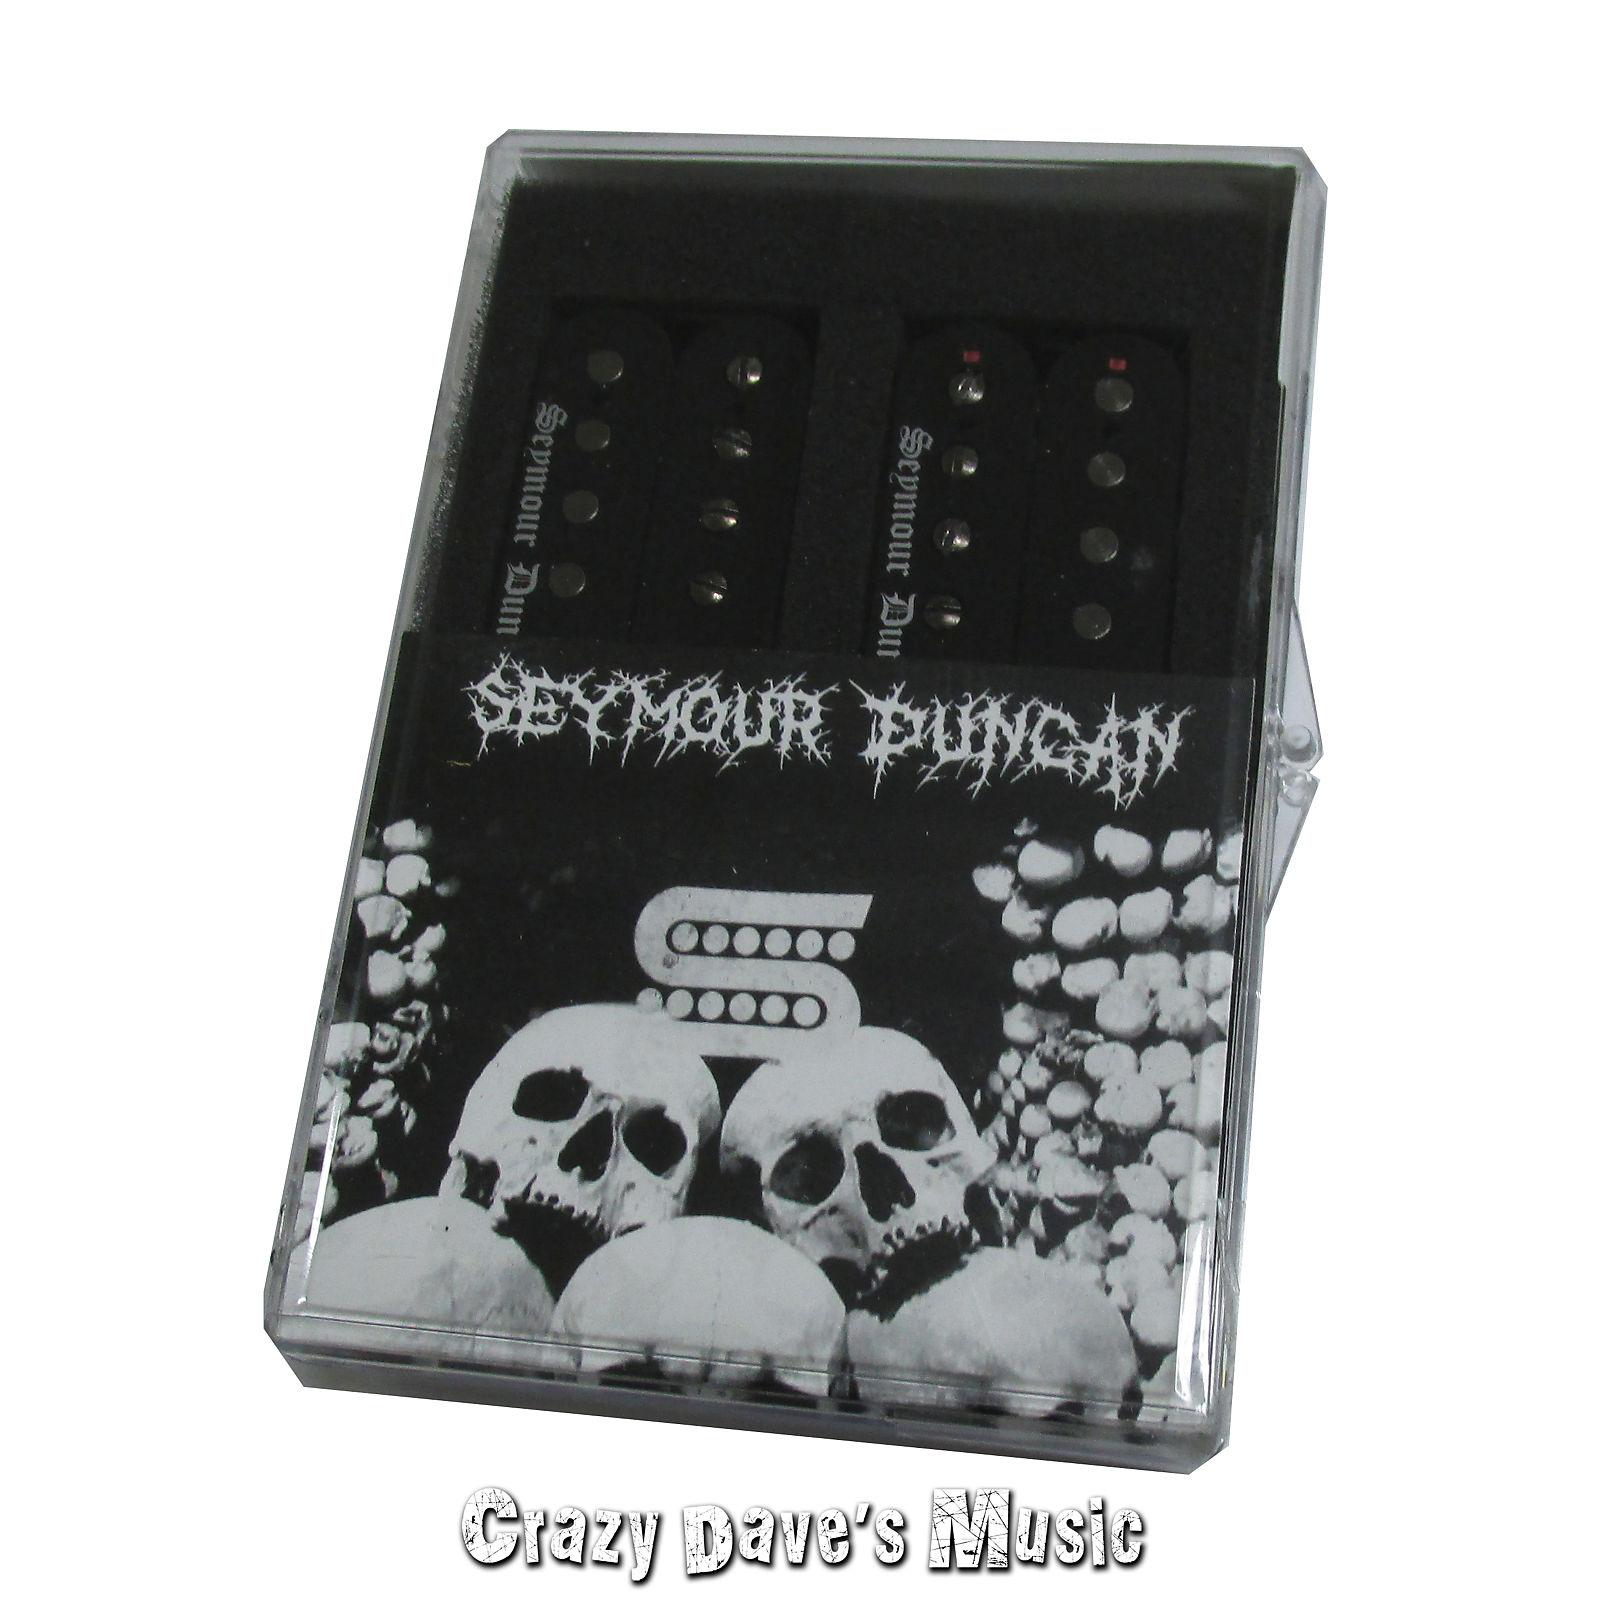 Seymour Duncan Black Winter HB Set Humbucker Guitar Pickups